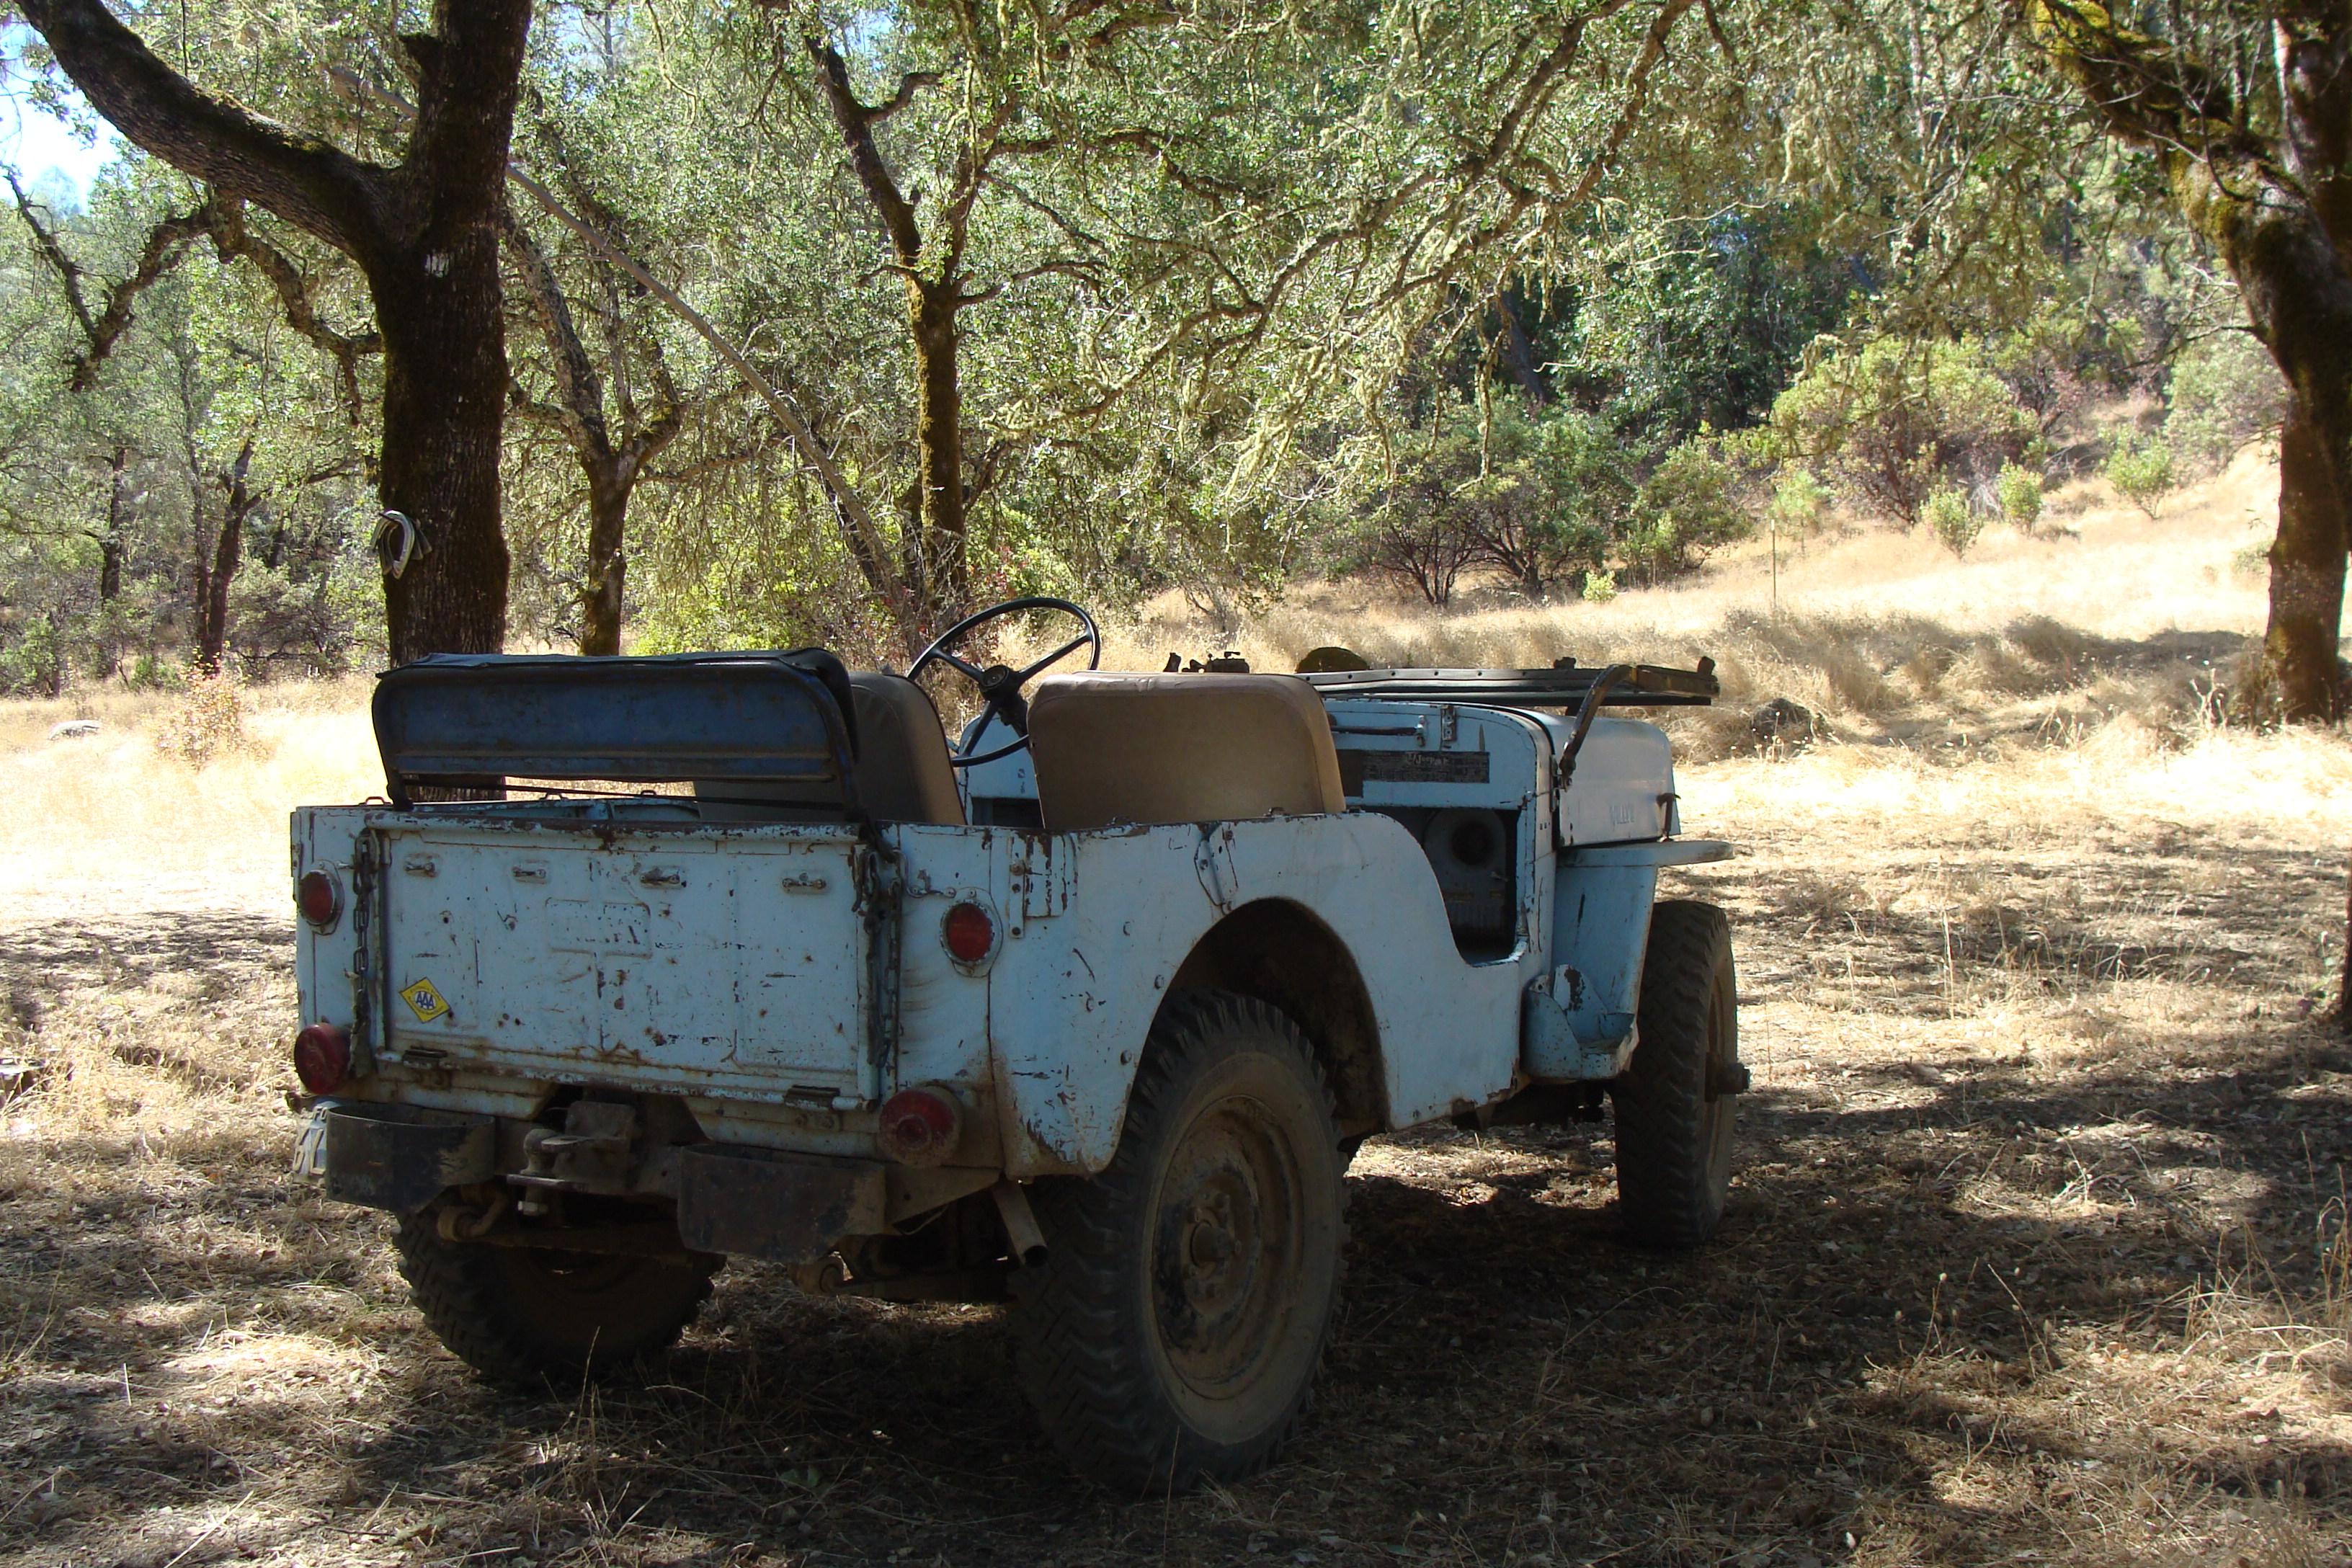 An old World War II. jeep ride at Heibel Vineyards